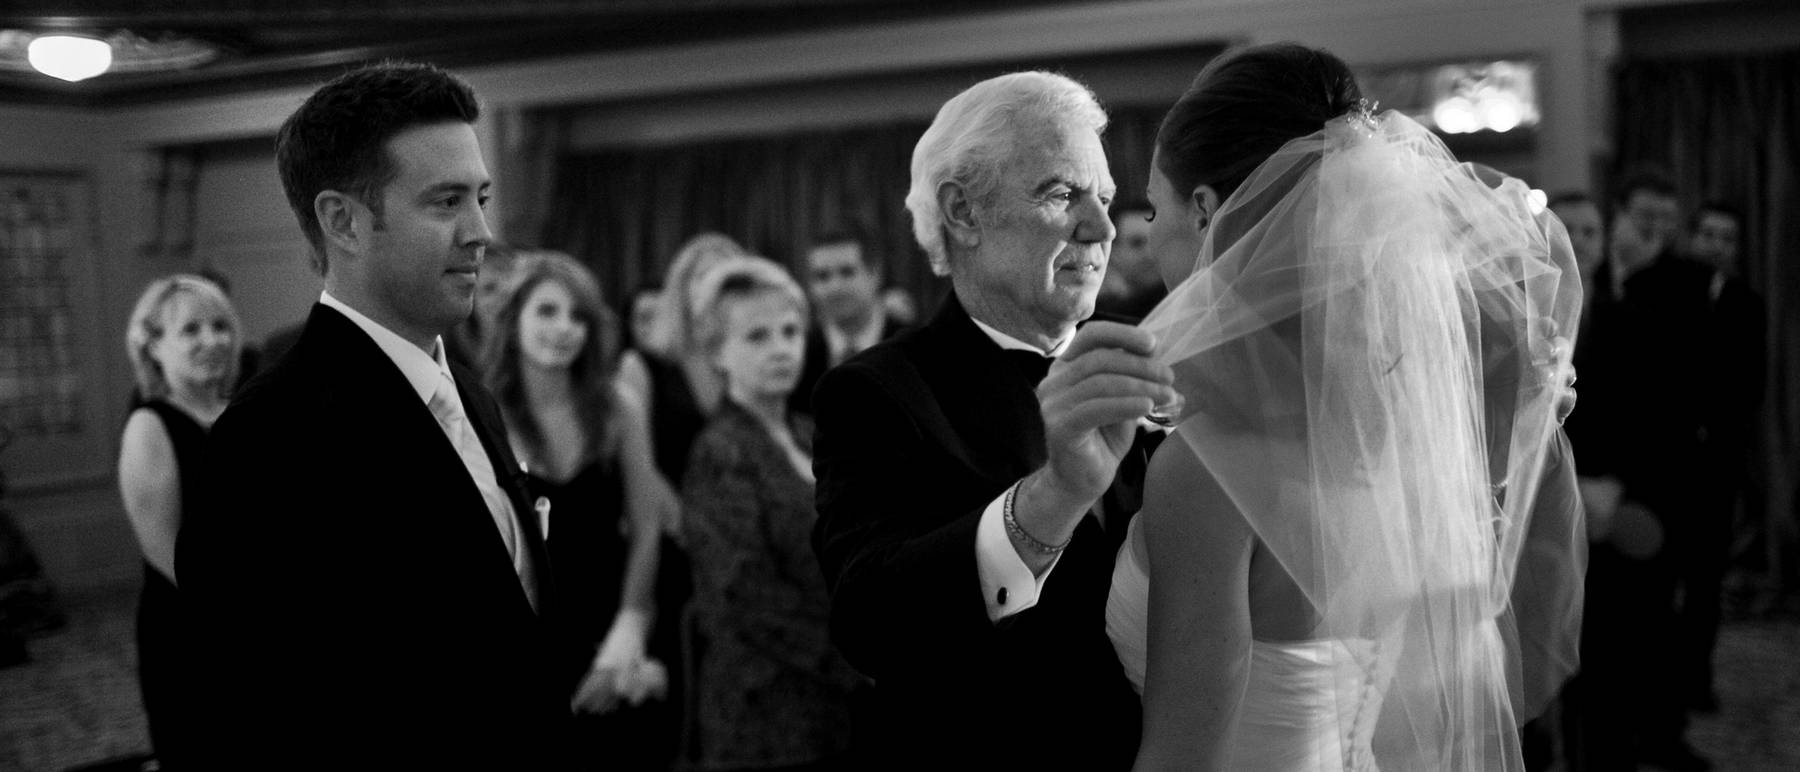 johnandjoseph-wedding-photographer-hz-slider-182